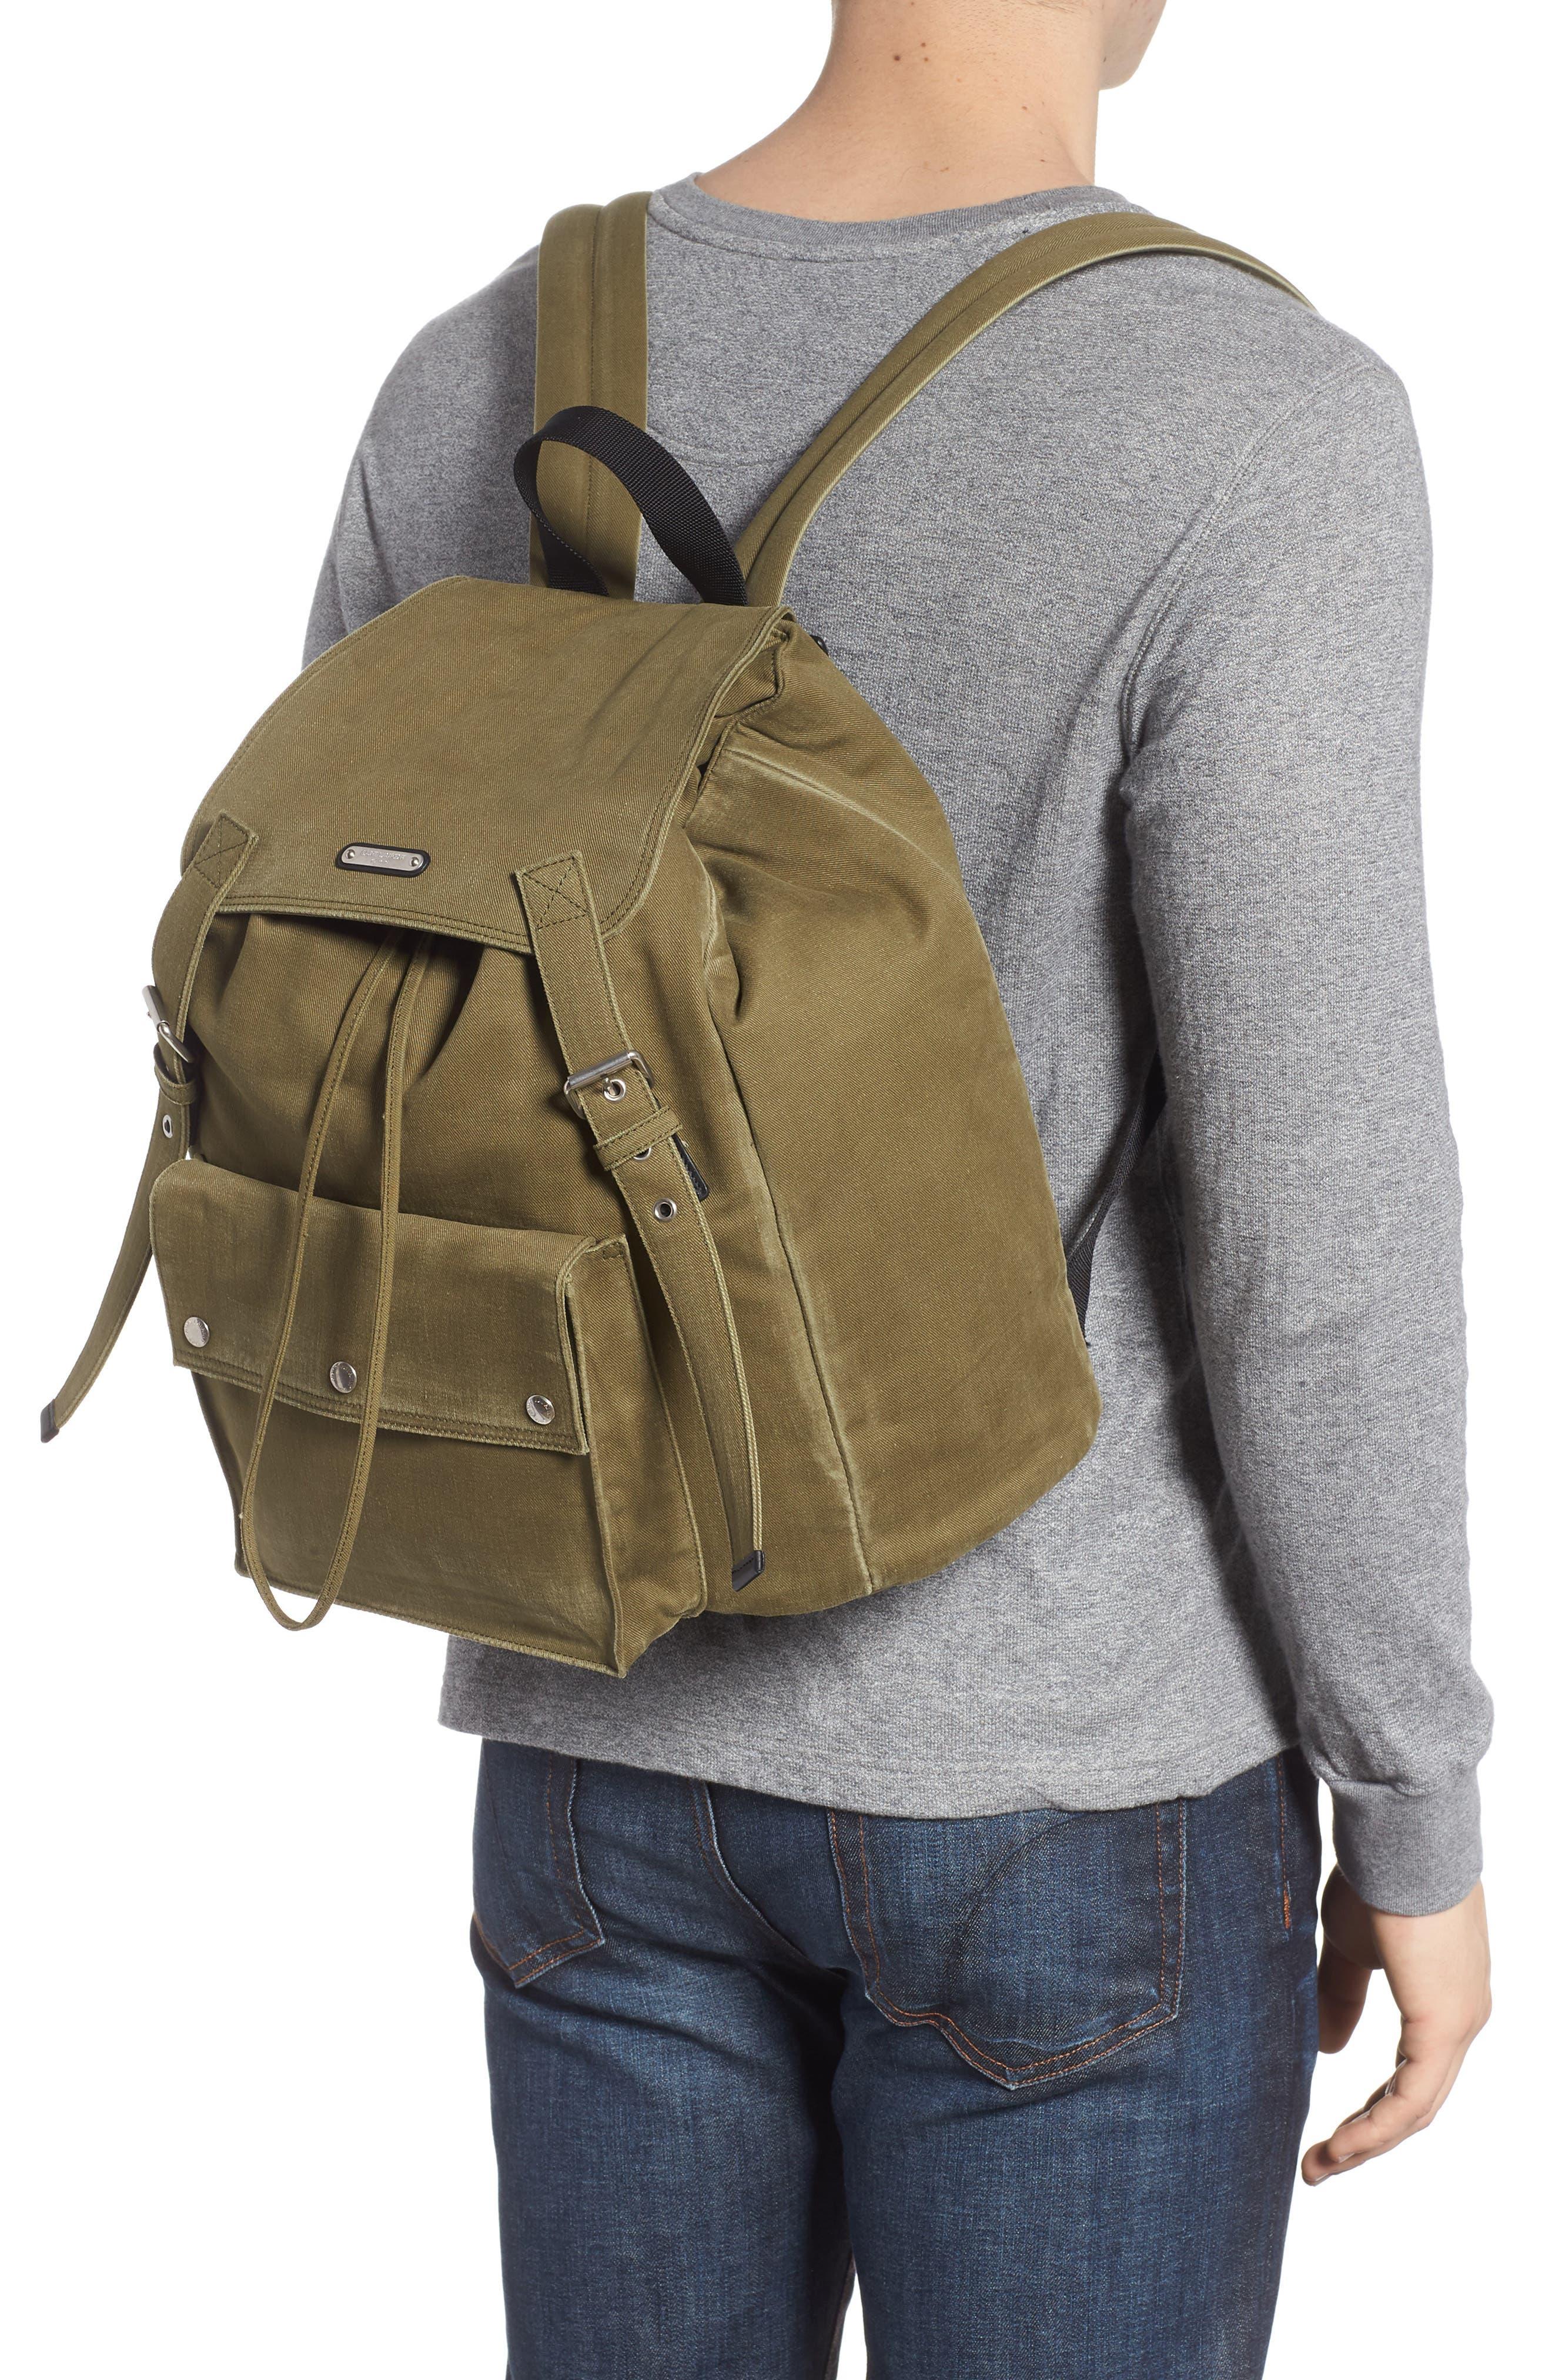 Noe Flap Backpack,                             Alternate thumbnail 2, color,                             300